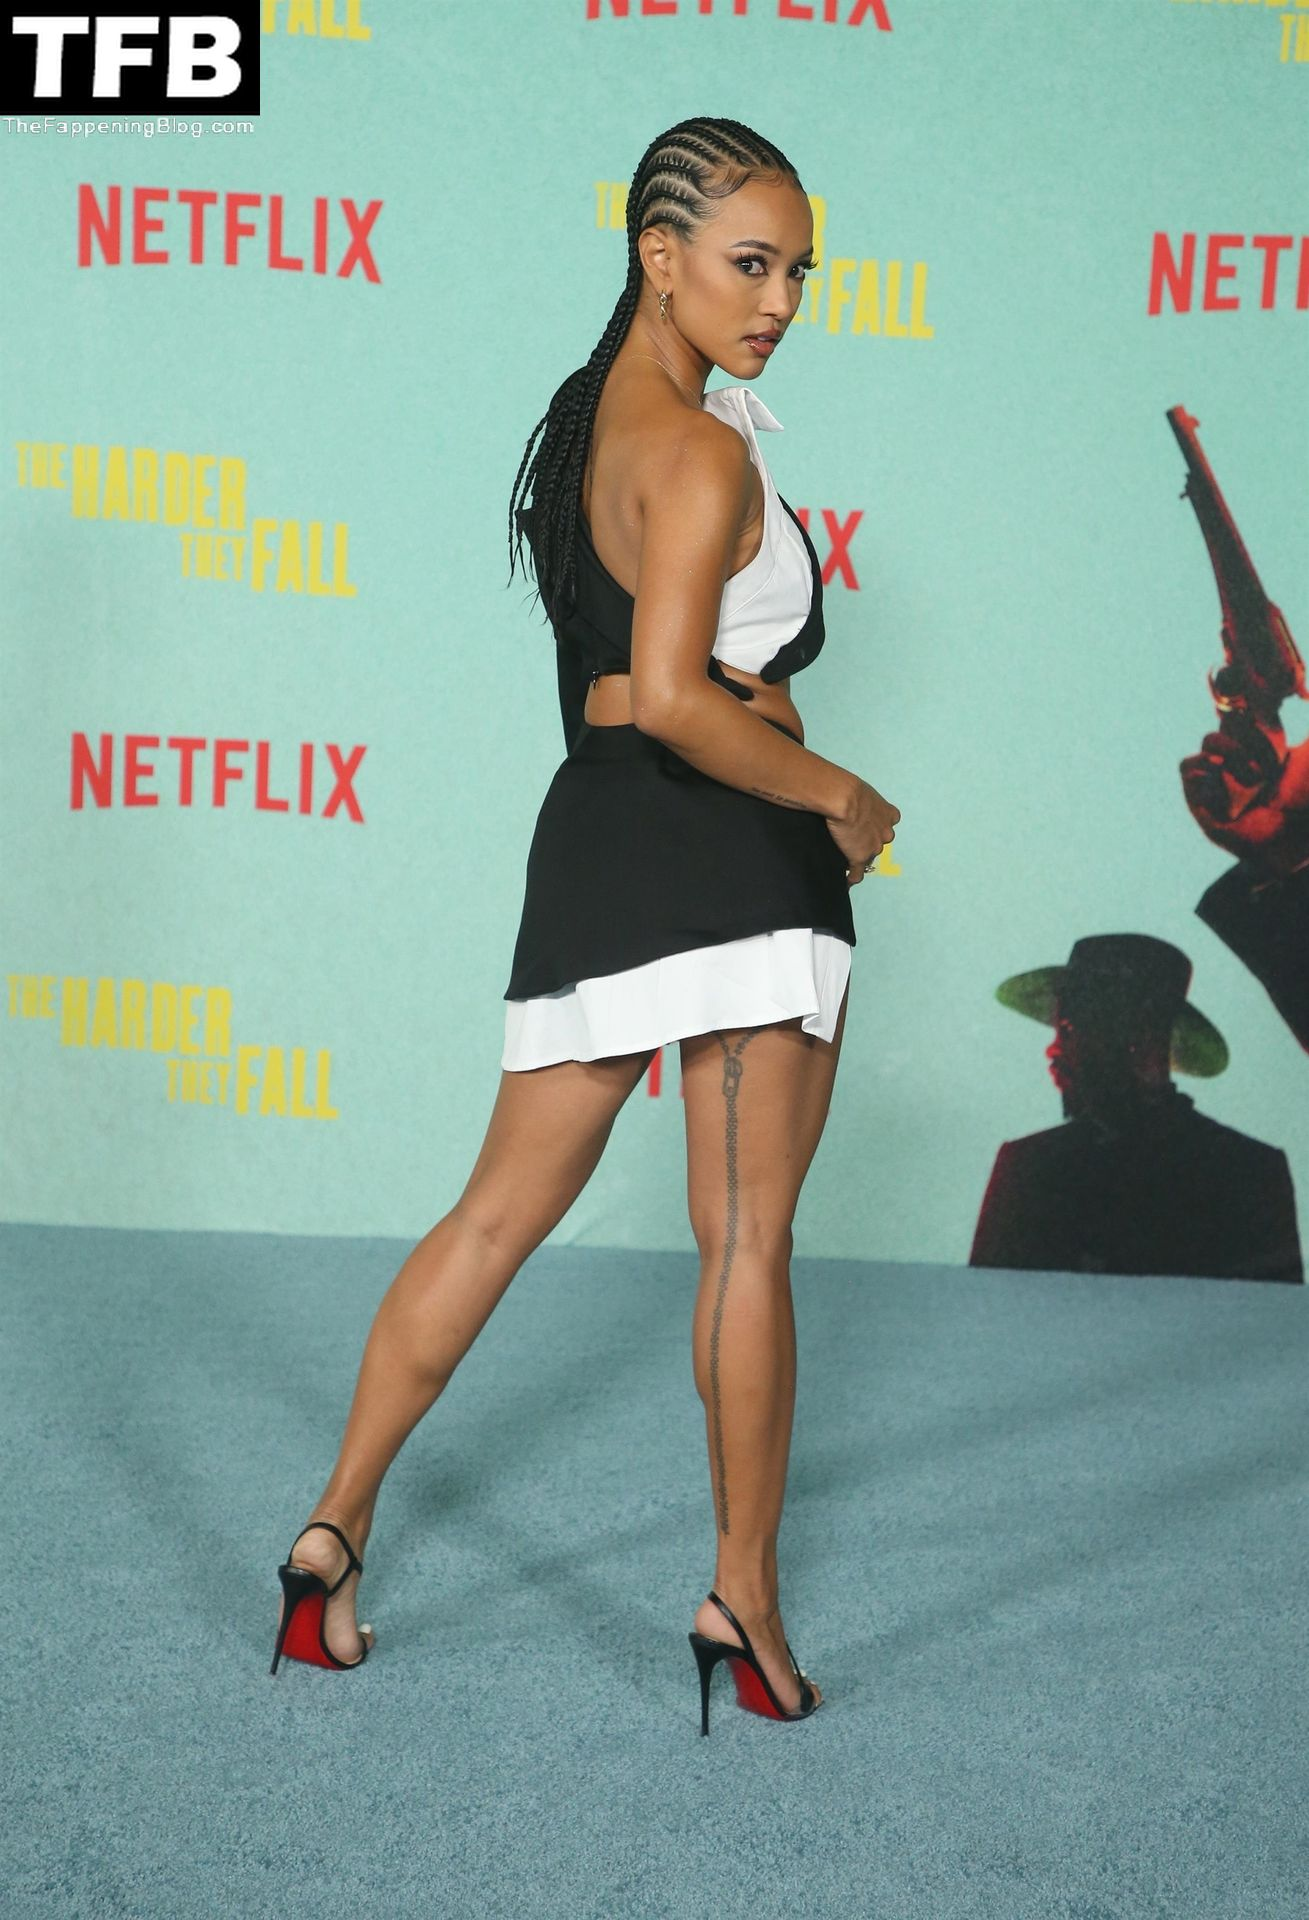 Karrueche-Tran-Sexy-Legs-Upskirt-The-Fappening-Blog-4.jpg